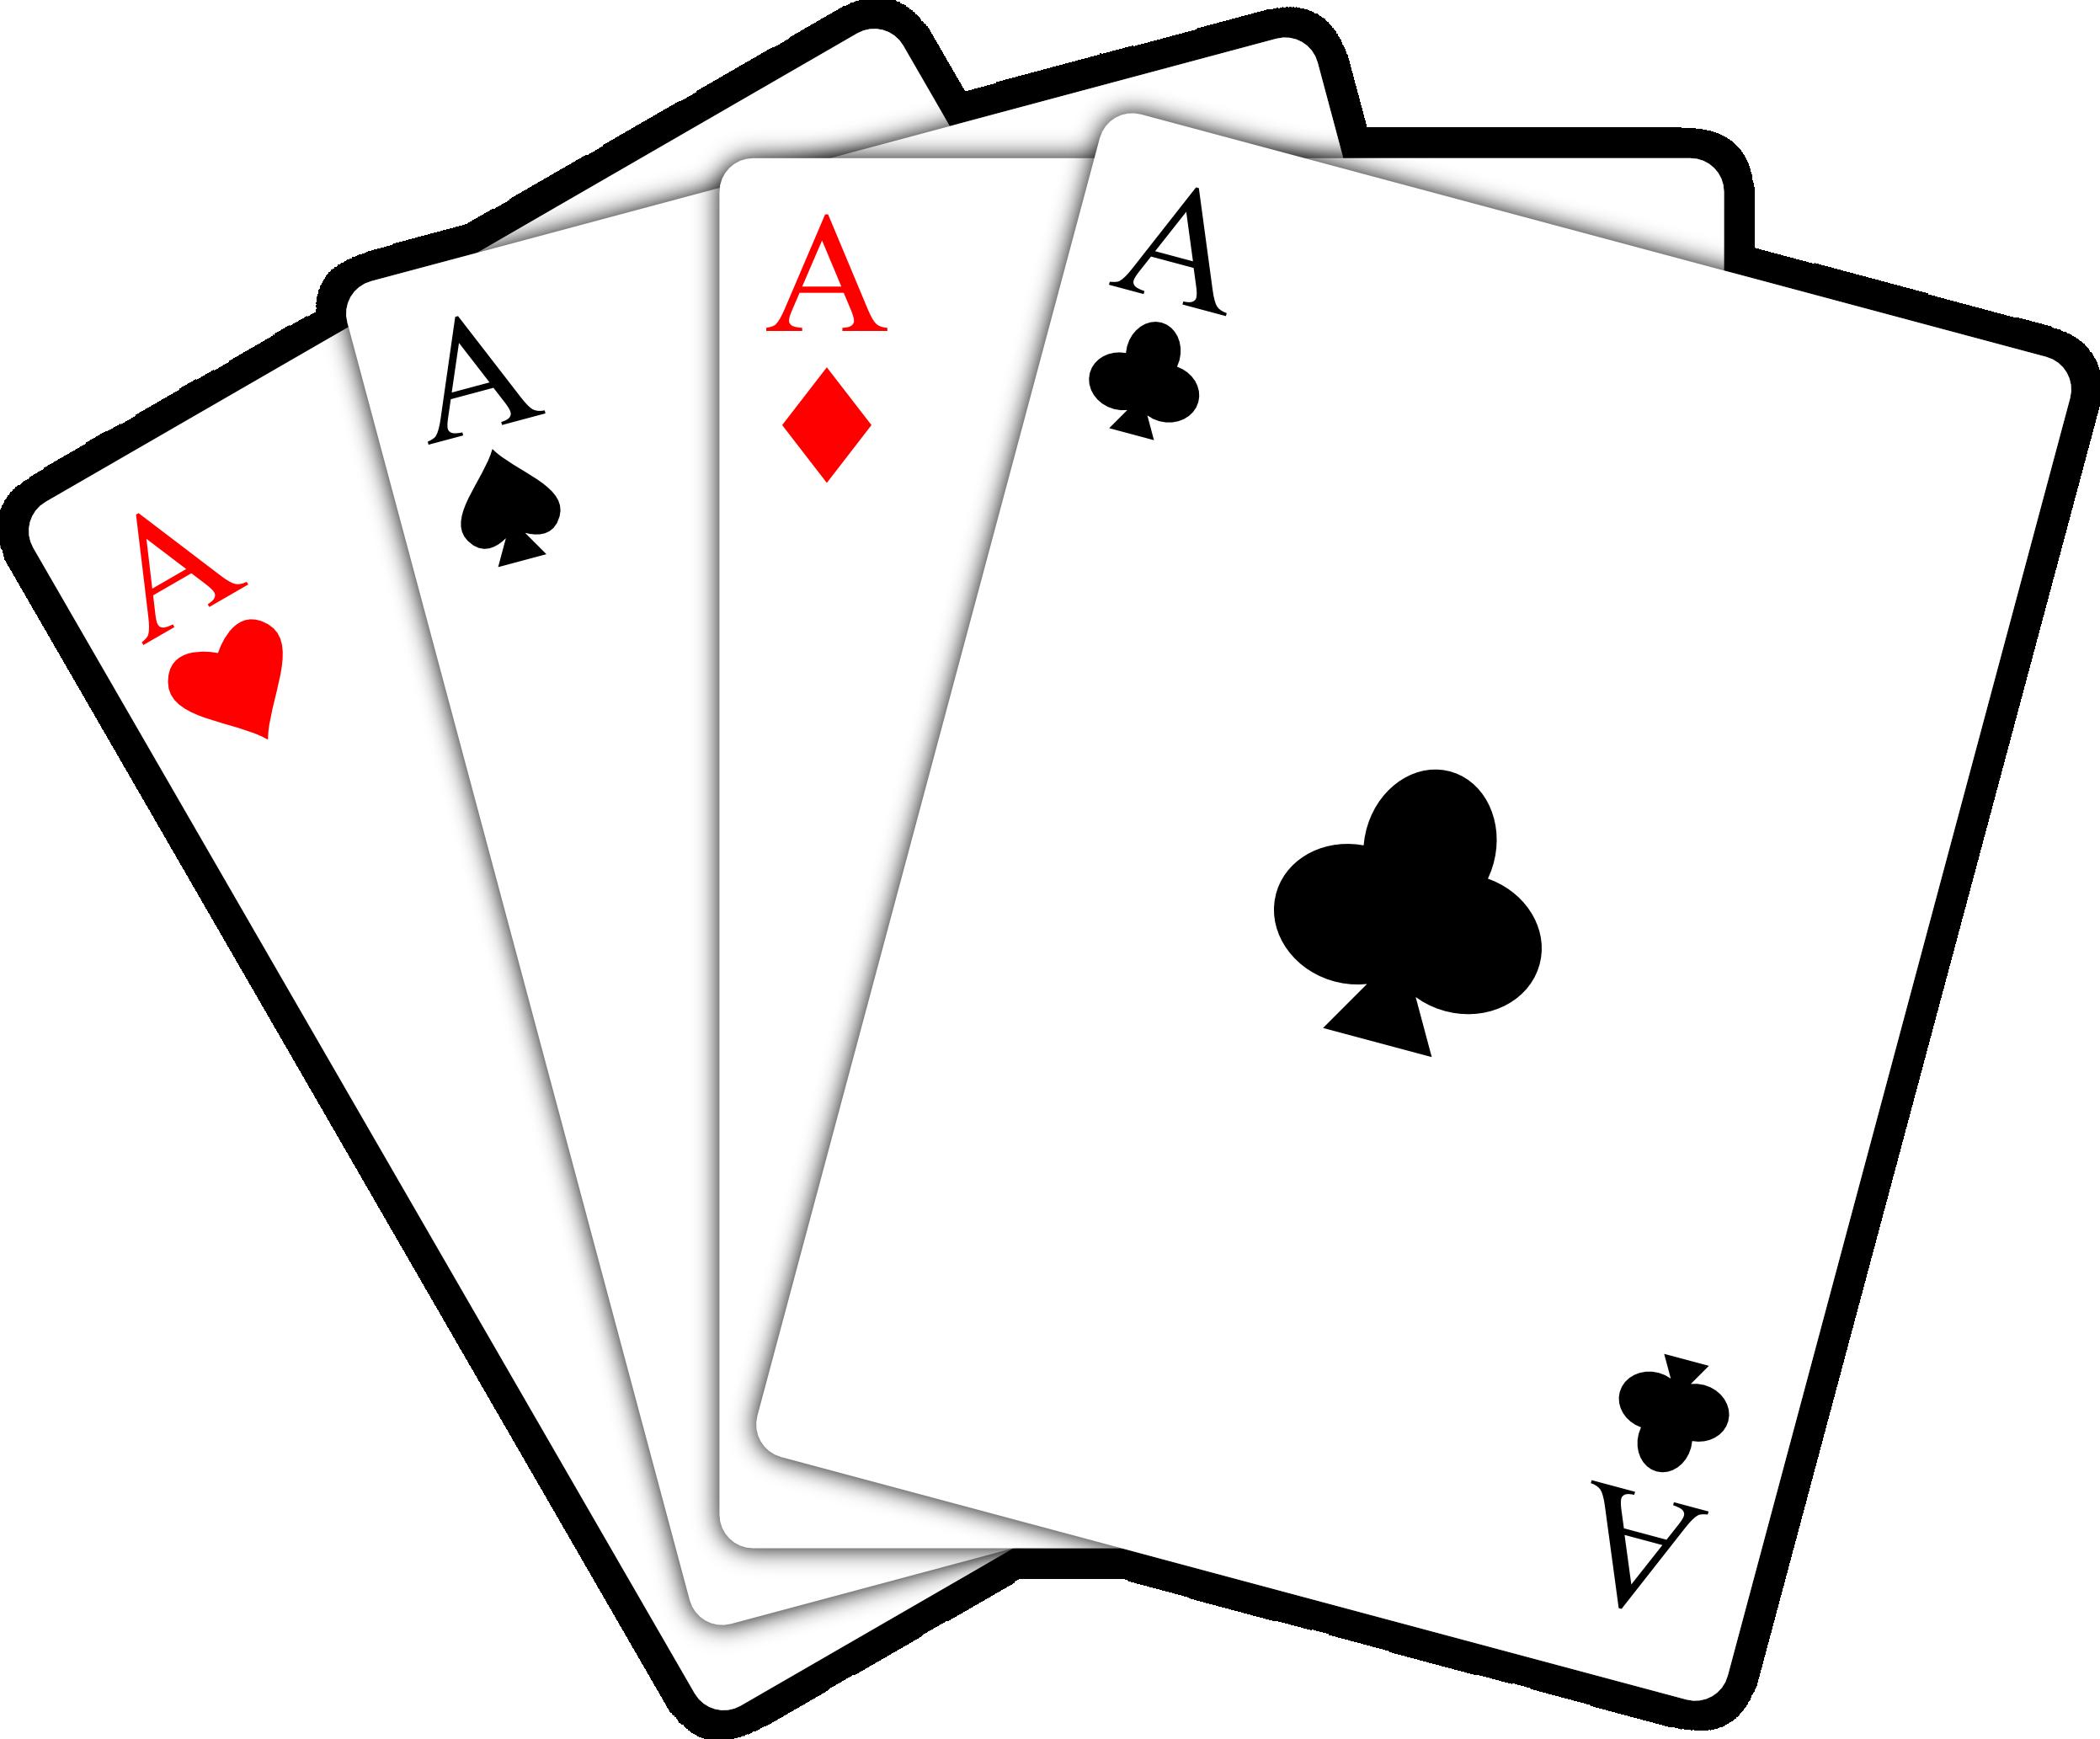 Cards HD wallpapers, Desktop wallpaper - most viewed